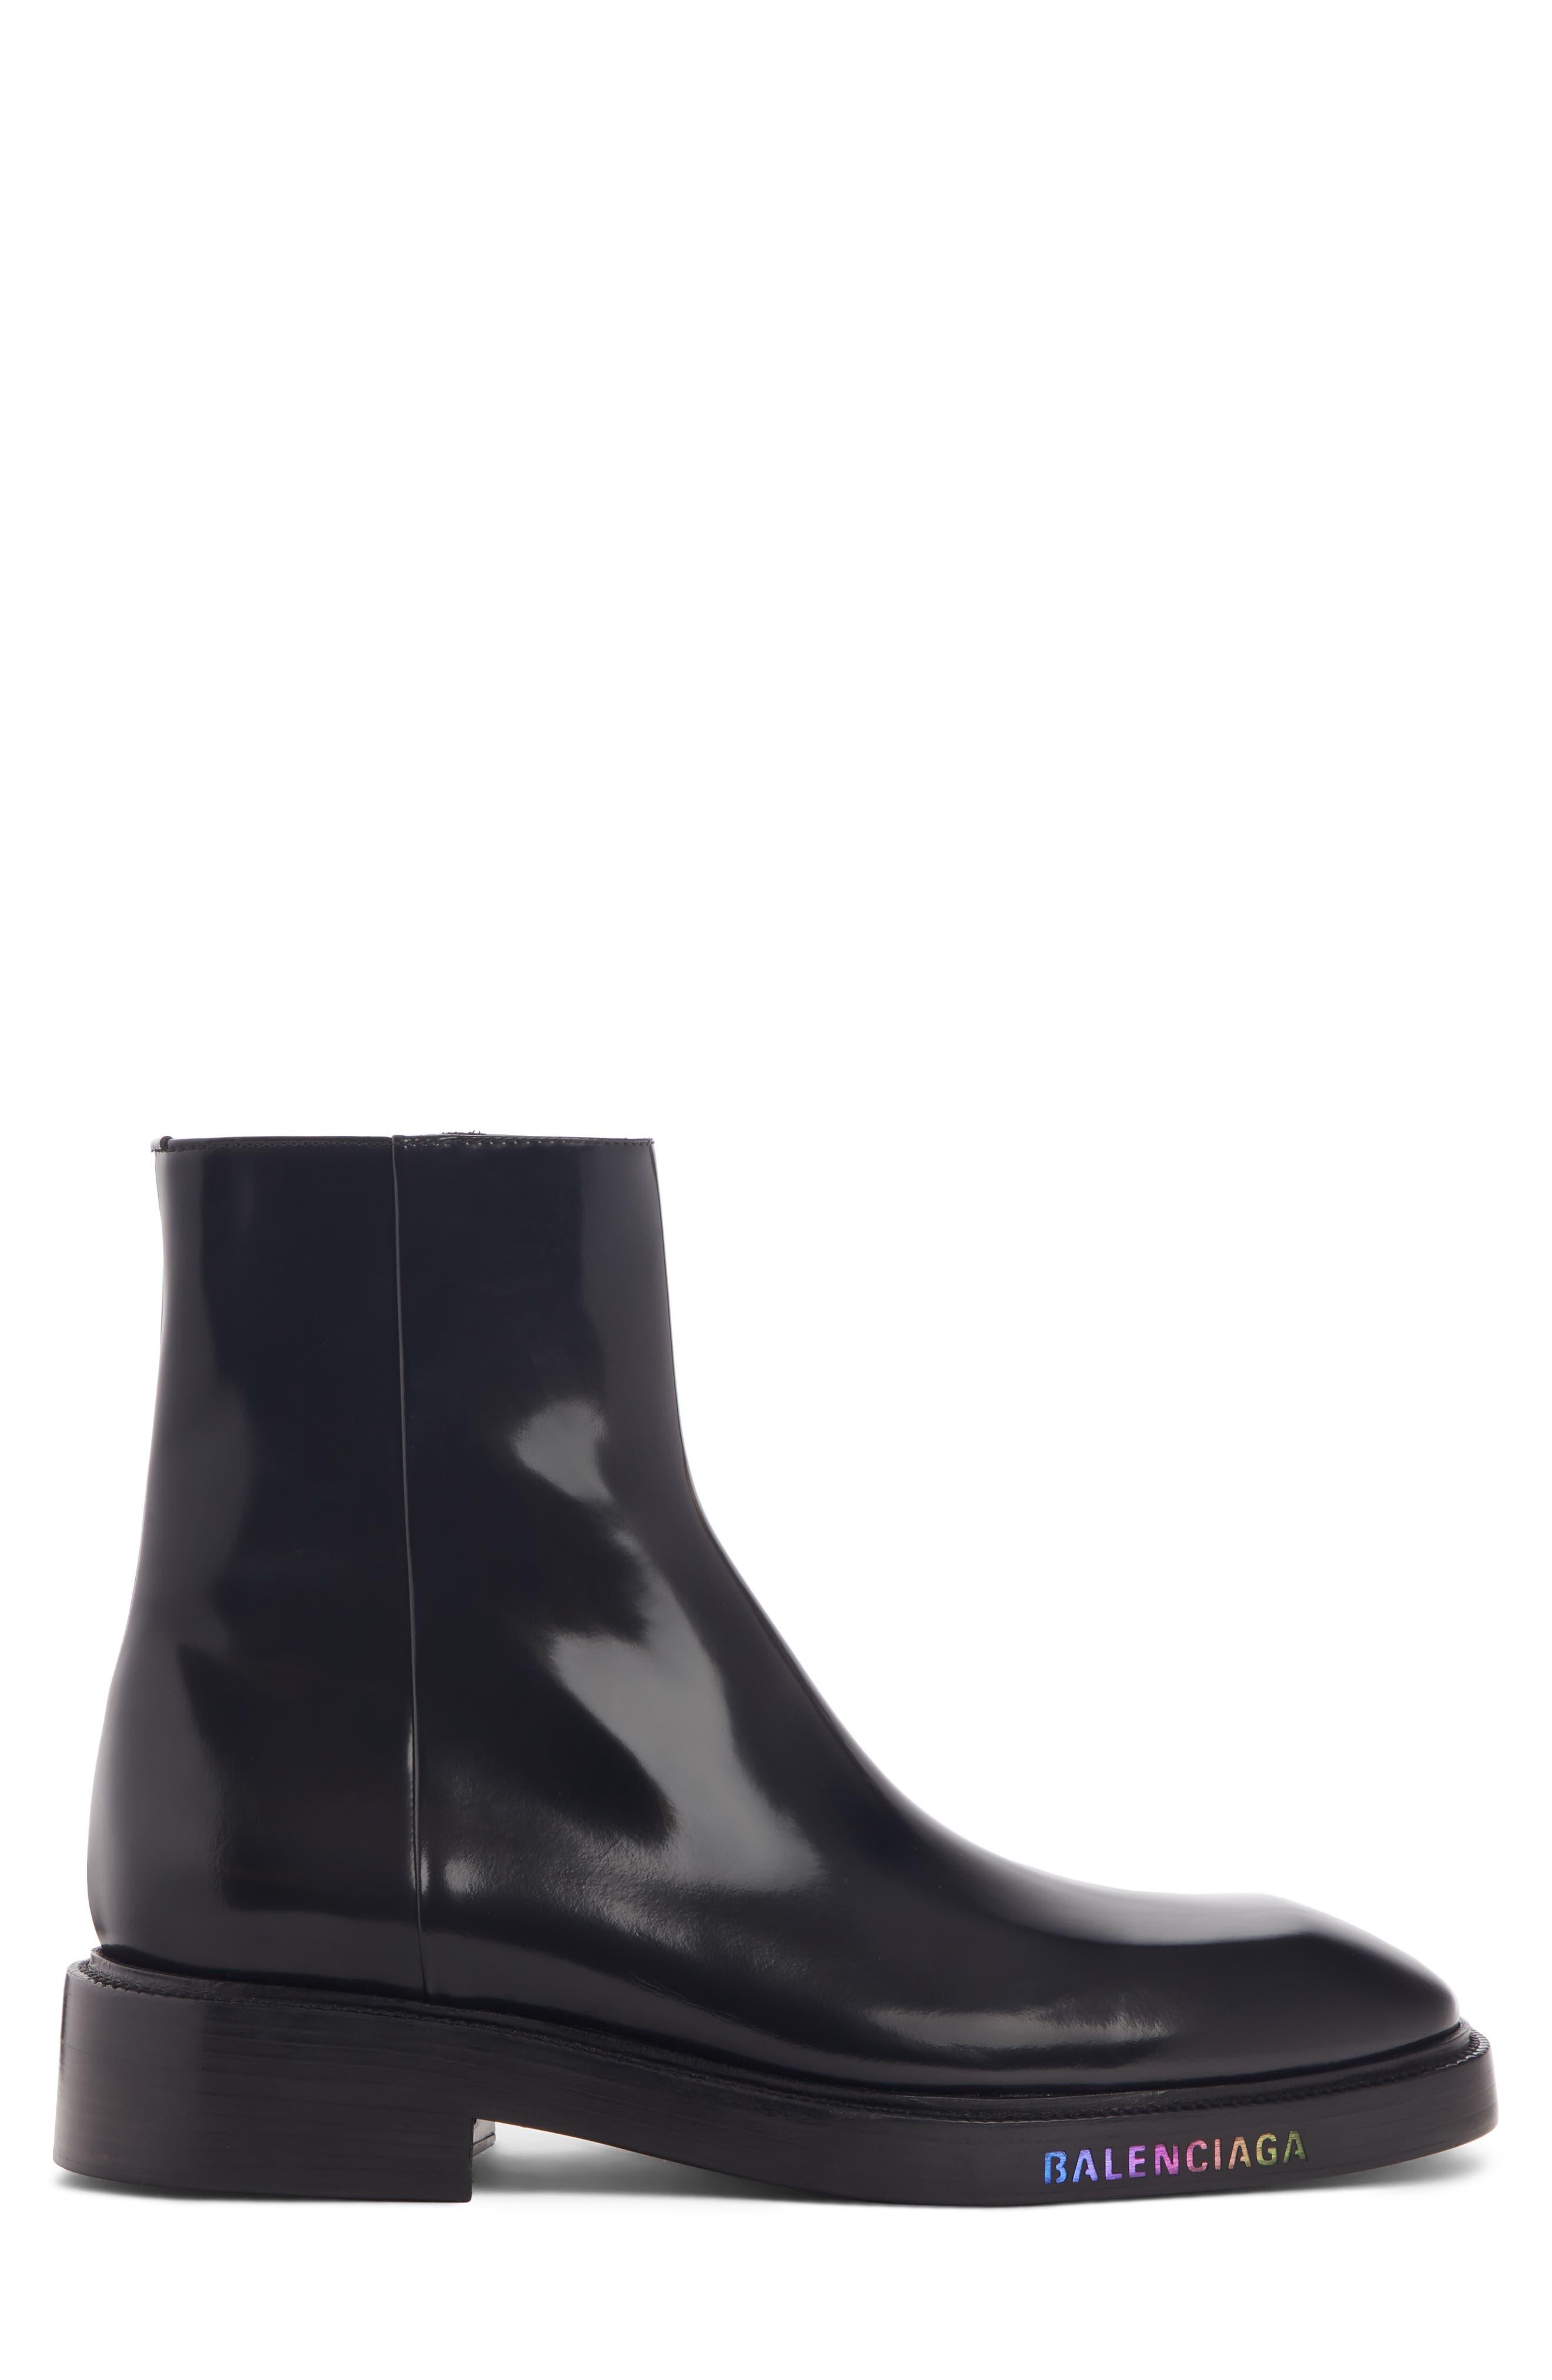 BALENCIAGA, LED Curve Light-Up Boot, Alternate thumbnail 3, color, BLACK